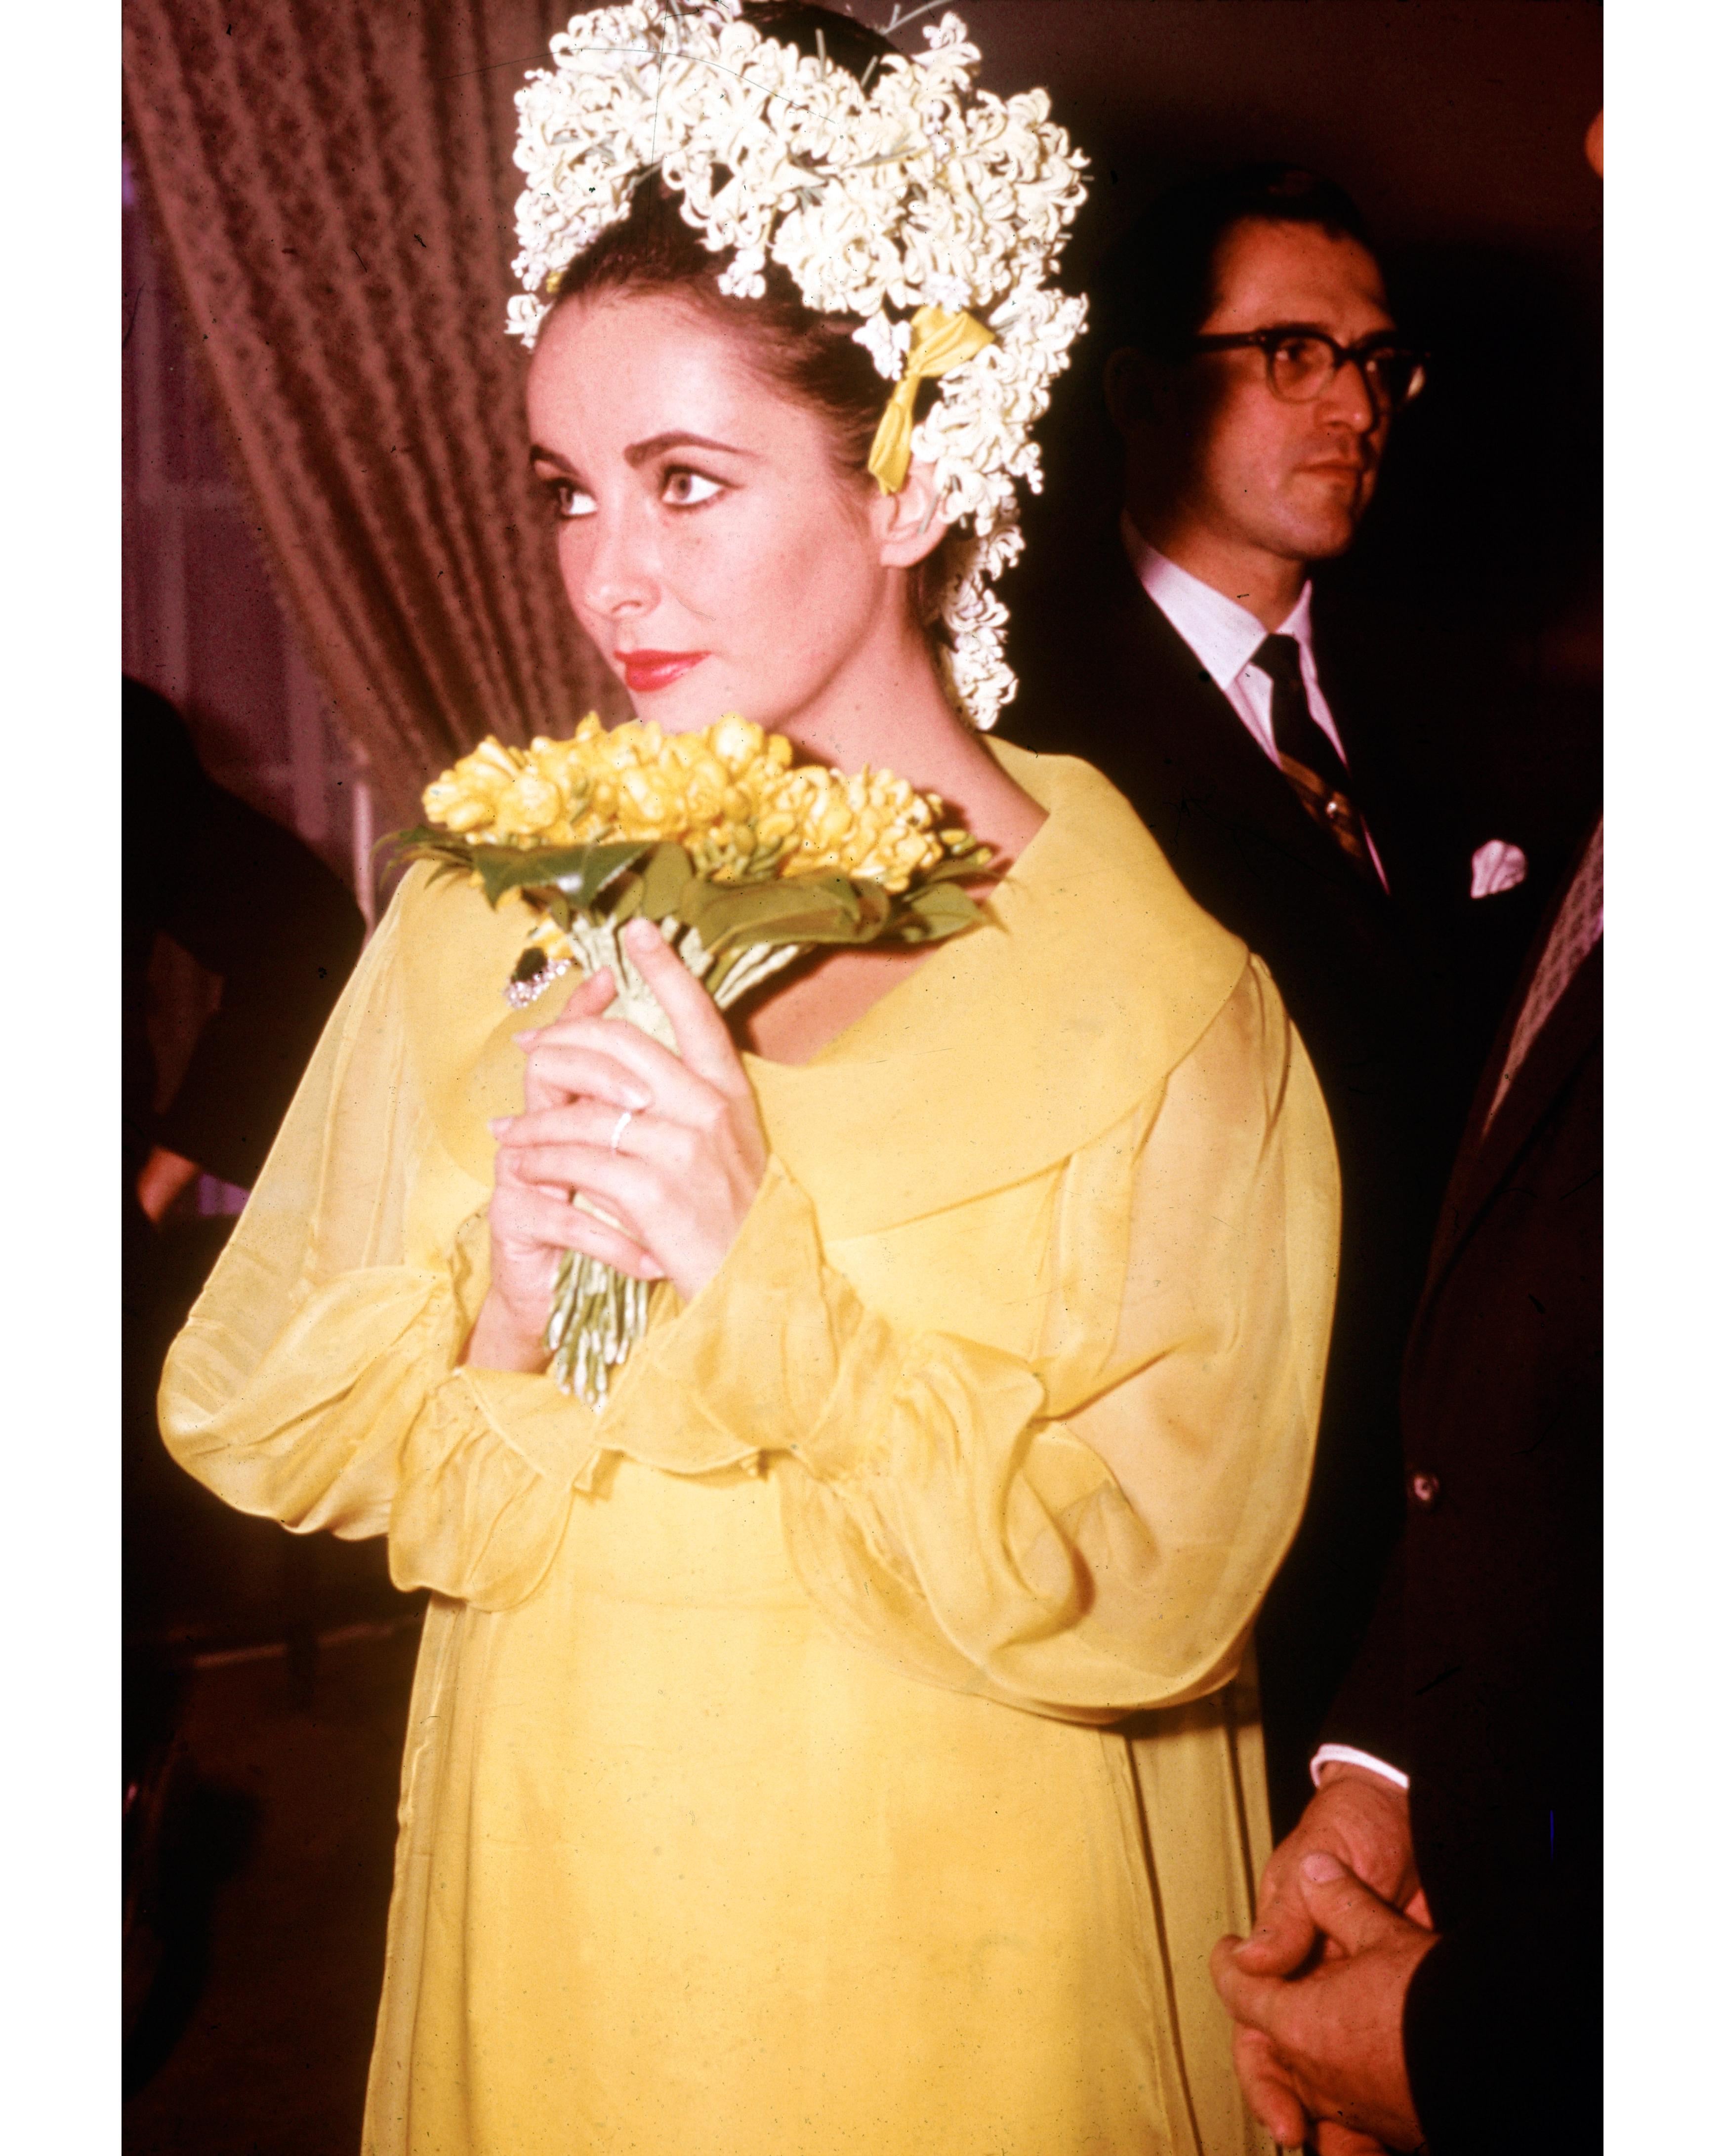 celebrity-colorful-wedding-dresses-elizabeth-taylor-yellow-gettyimages-2931188-0815.jpg